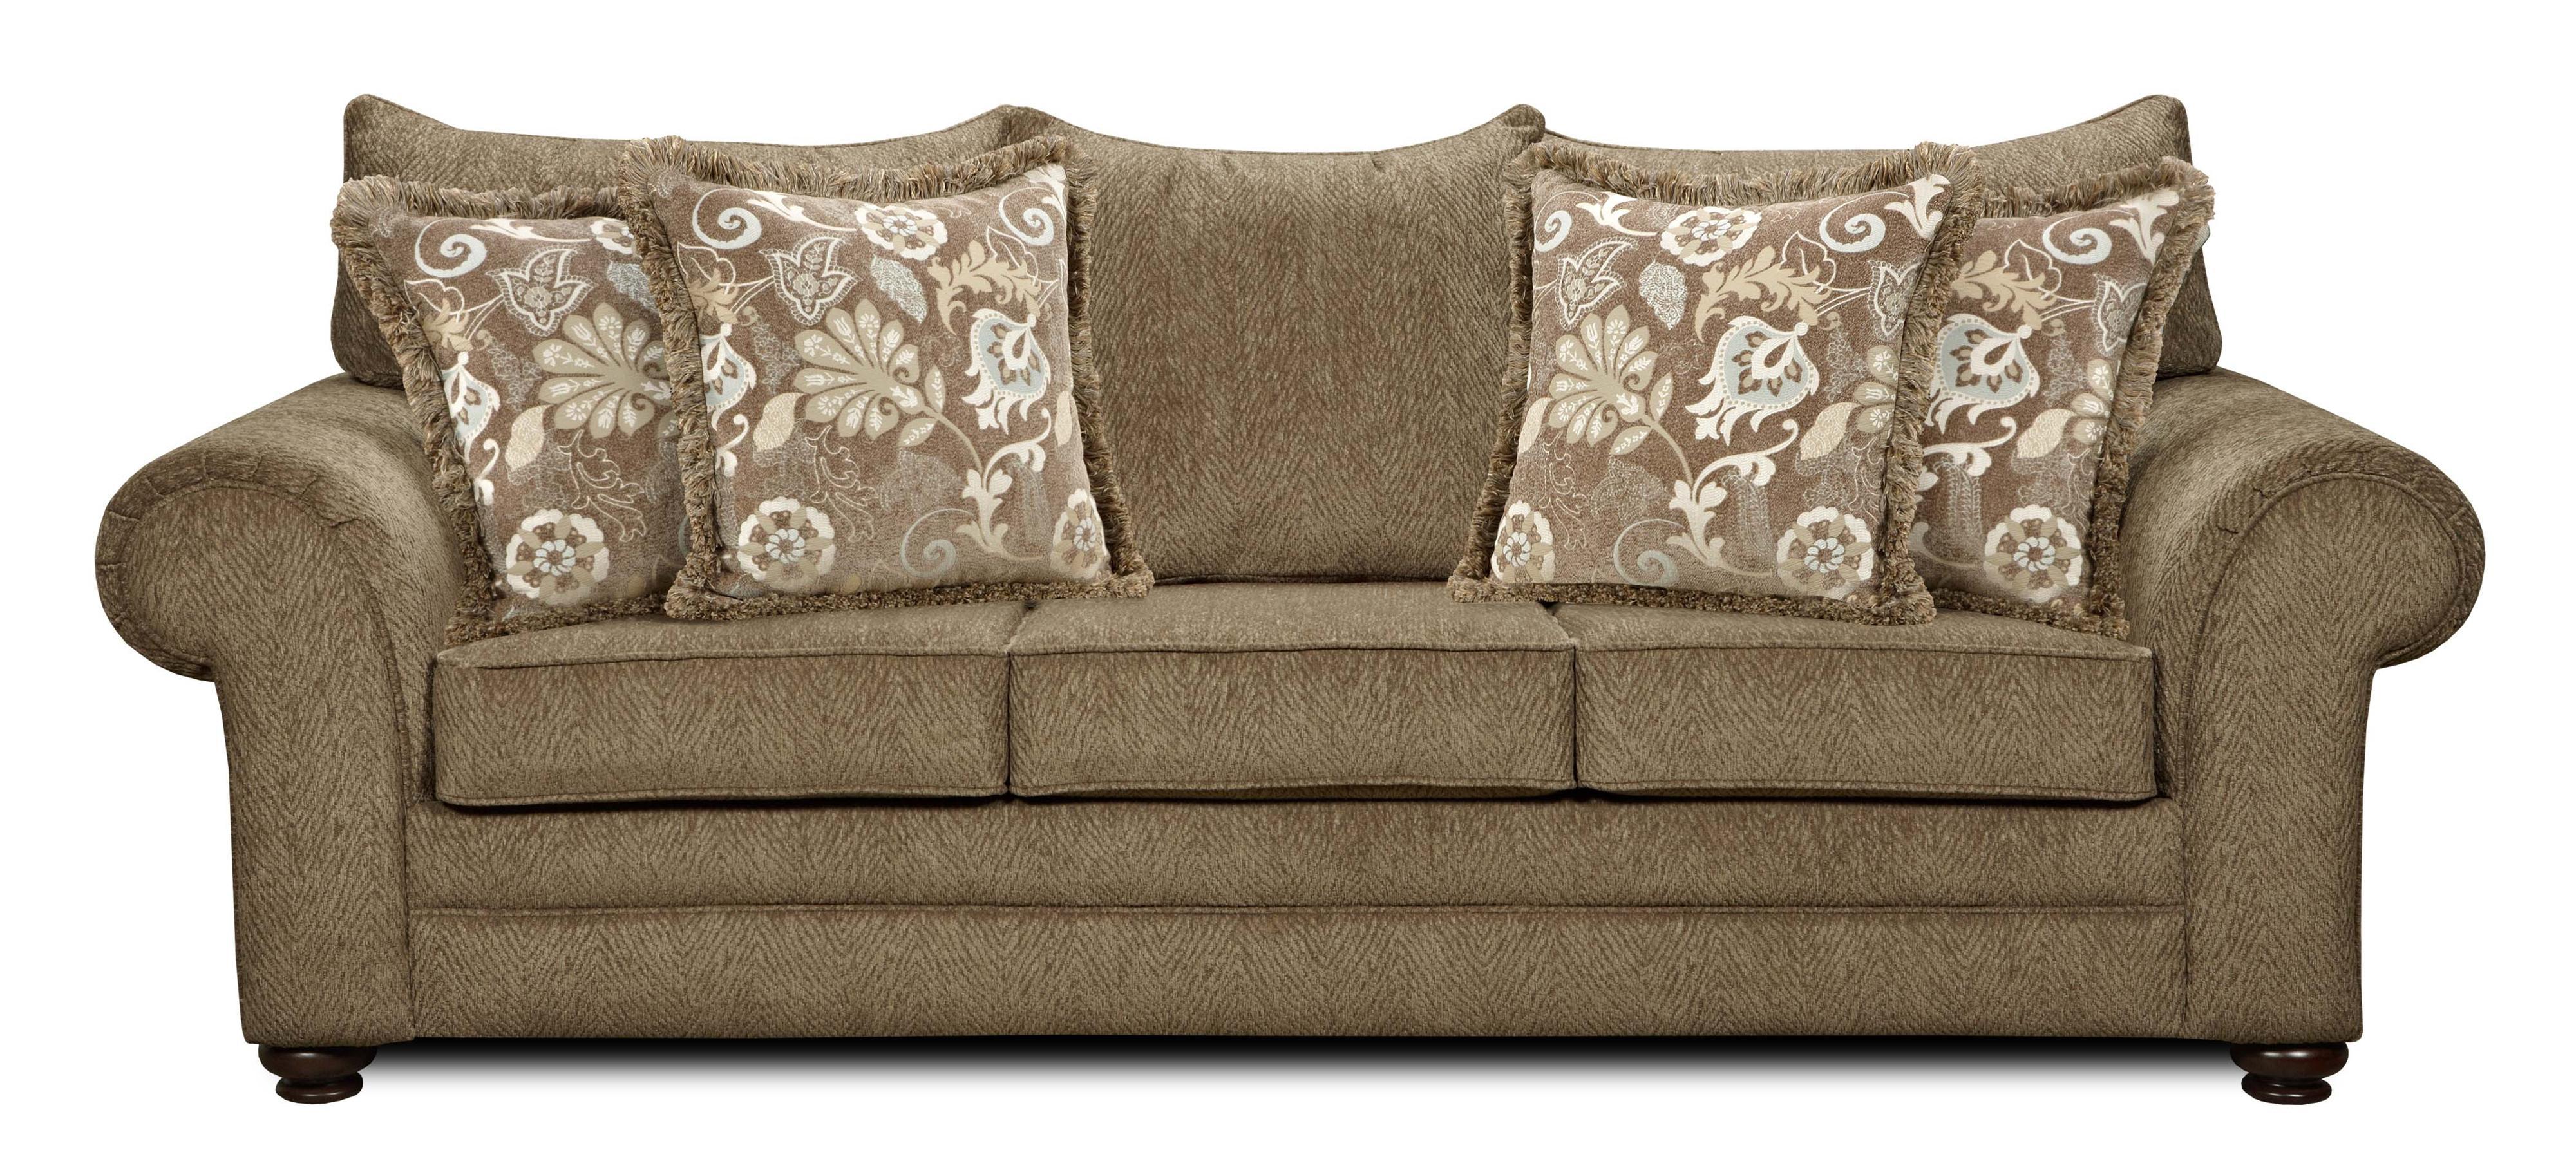 1120 Sofa by Washington Furniture at Lynn's Furniture & Mattress